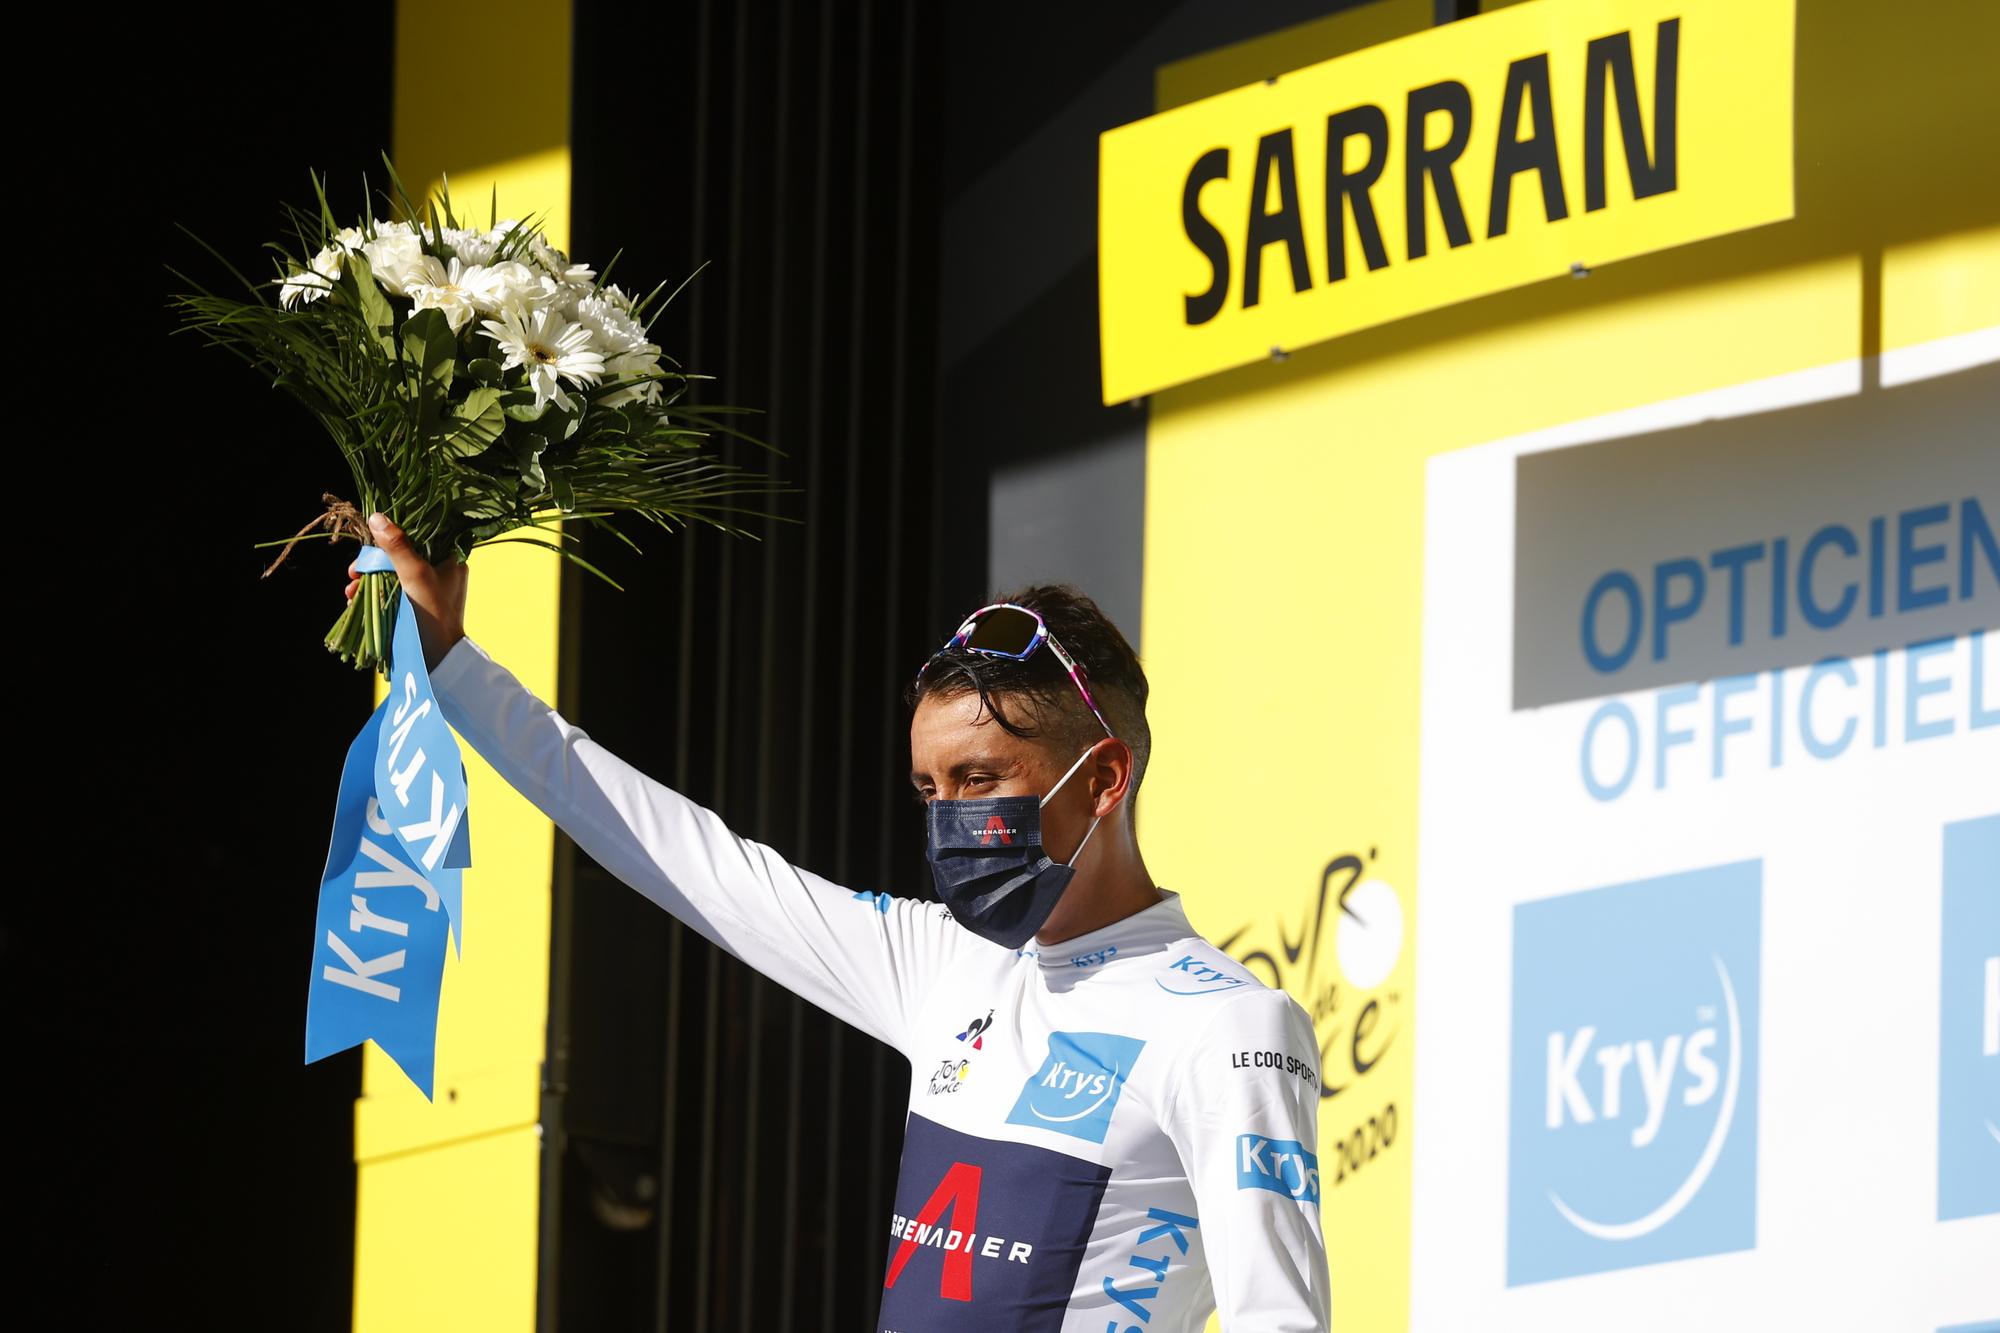 Tour de France 2020 107th Edition 12th stage Chauvigny Sarran km 218 10092020 Egan Bernal COL Team Ineos photo Luca BettiniBettiniPhoto2020